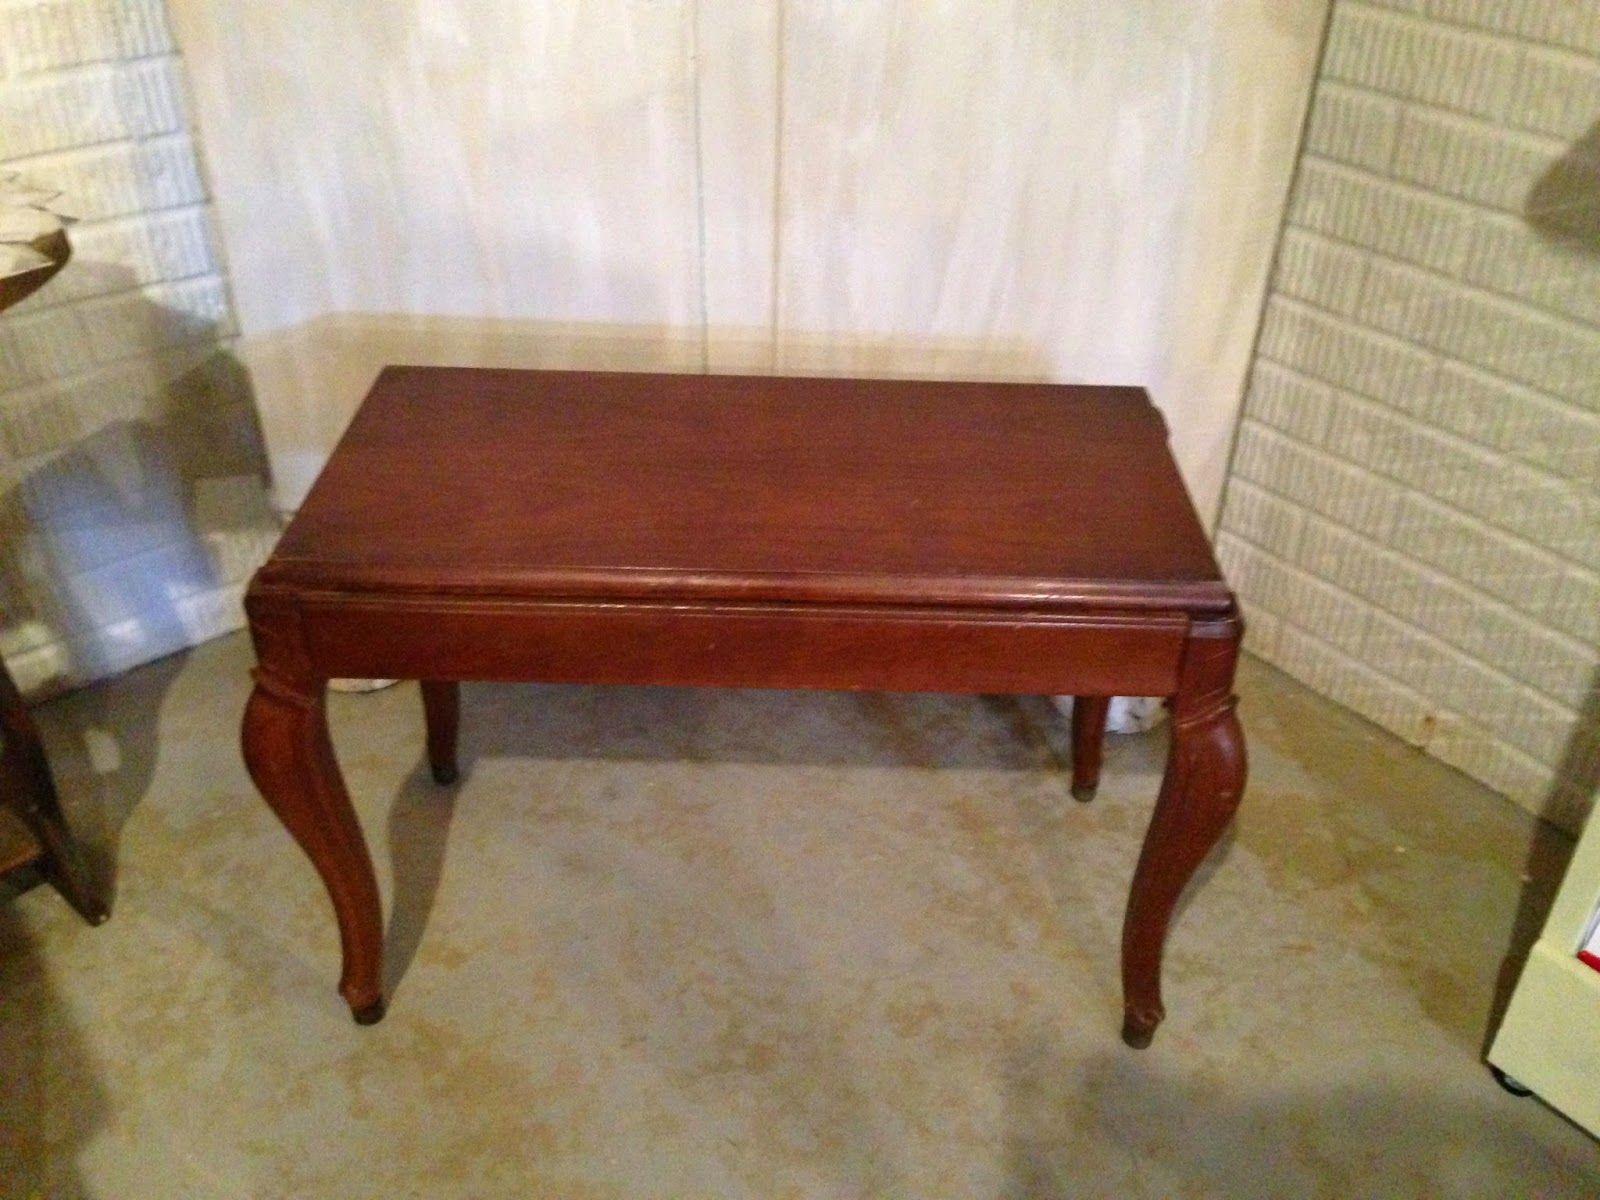 Thrifty Treasures: Plain piano bench goes glamorous